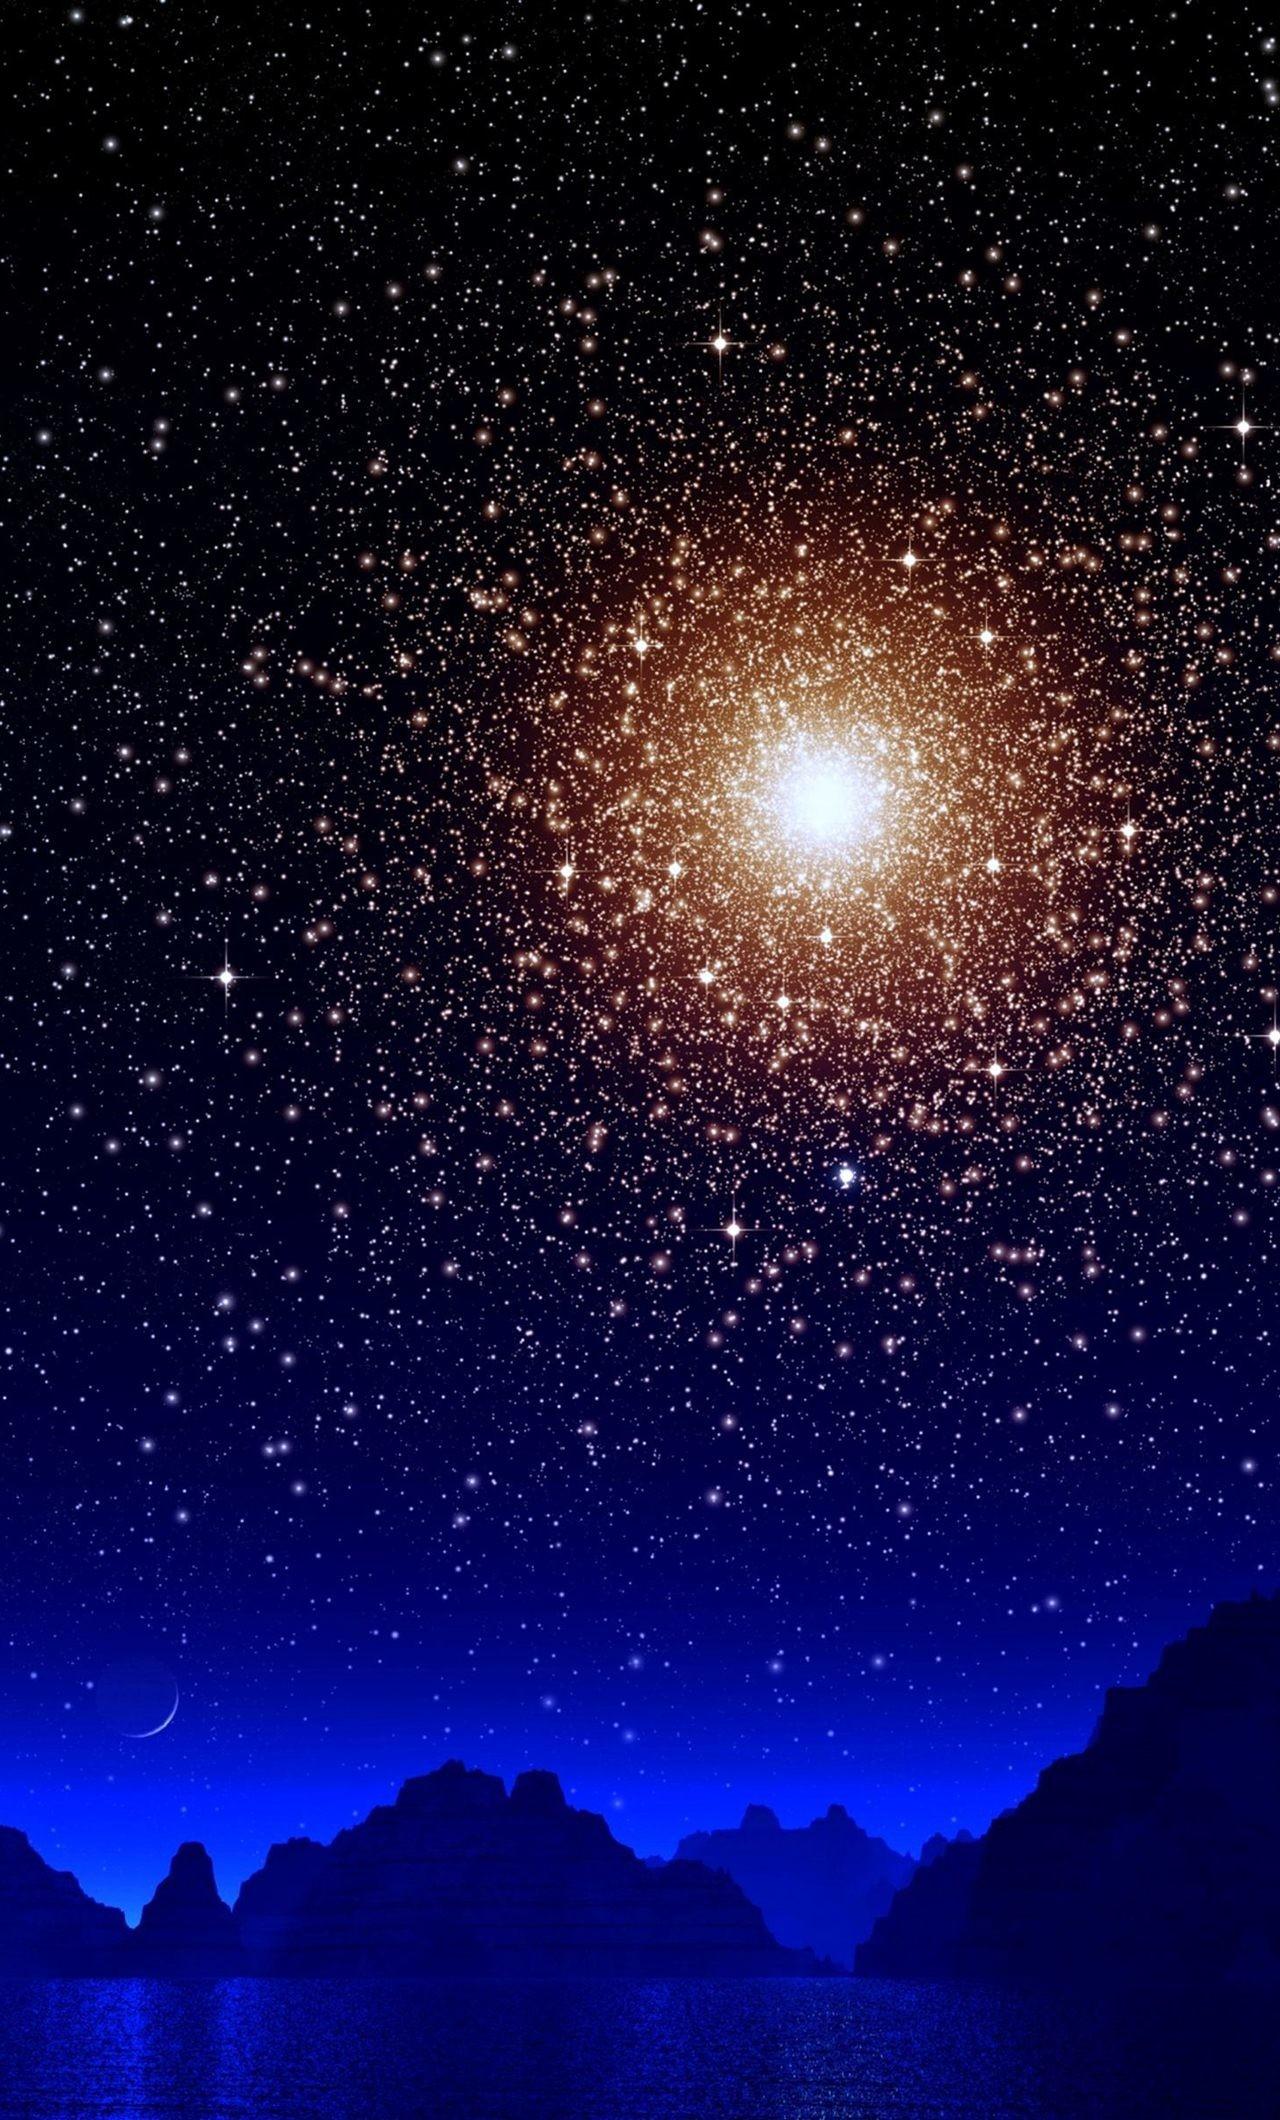 Sun Moon Stars Wallpaper 60 Pictures